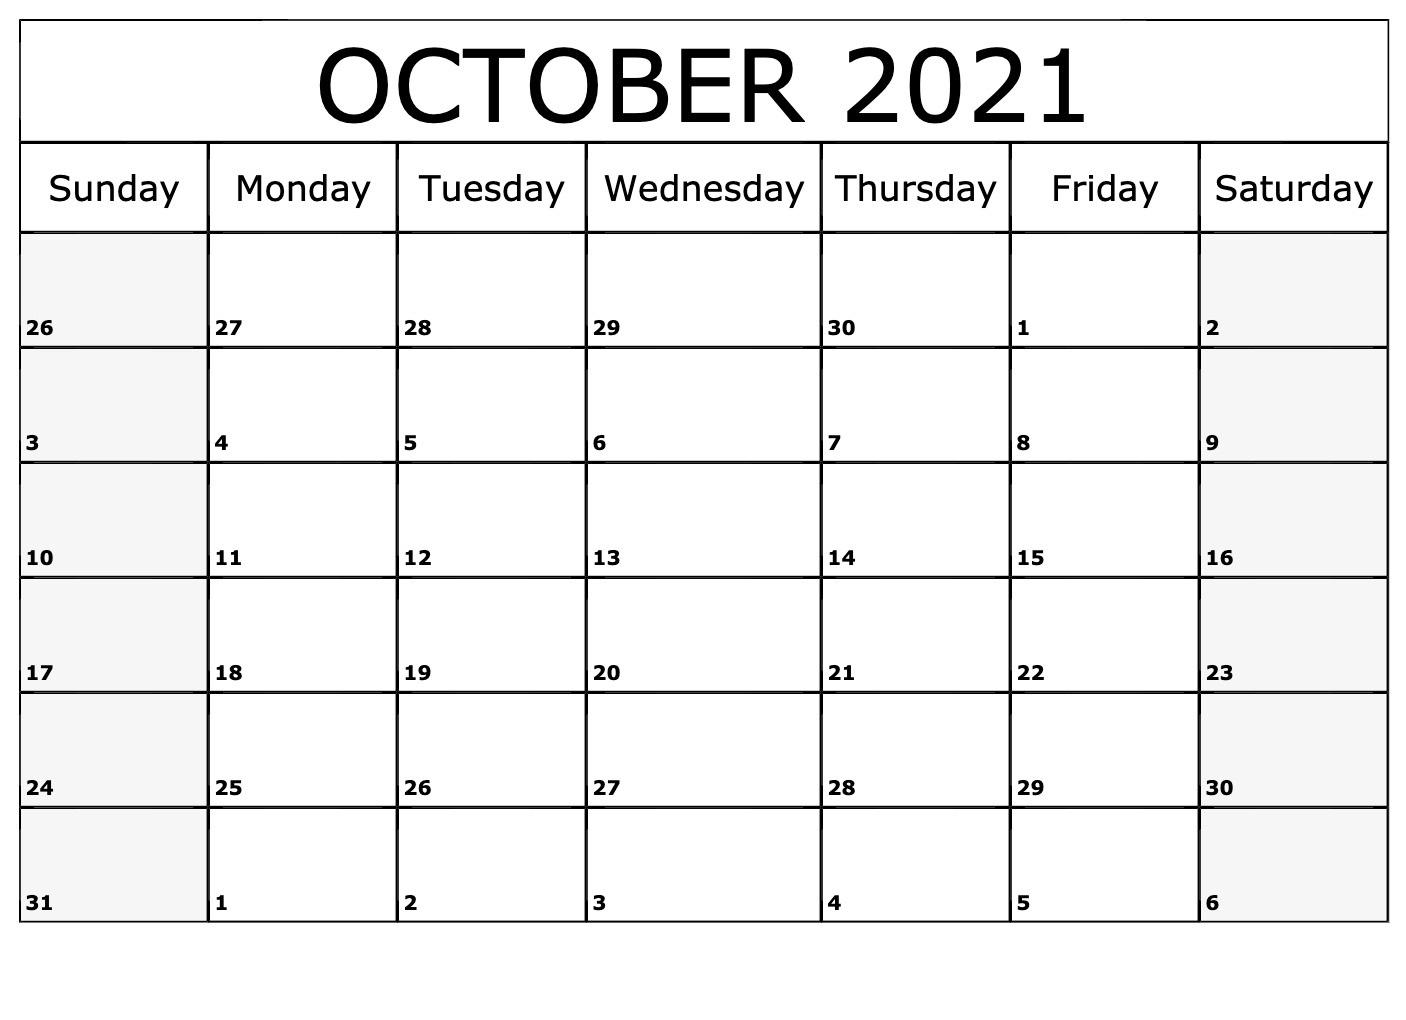 October 2021 Calendar Horizontally Free Layouts For